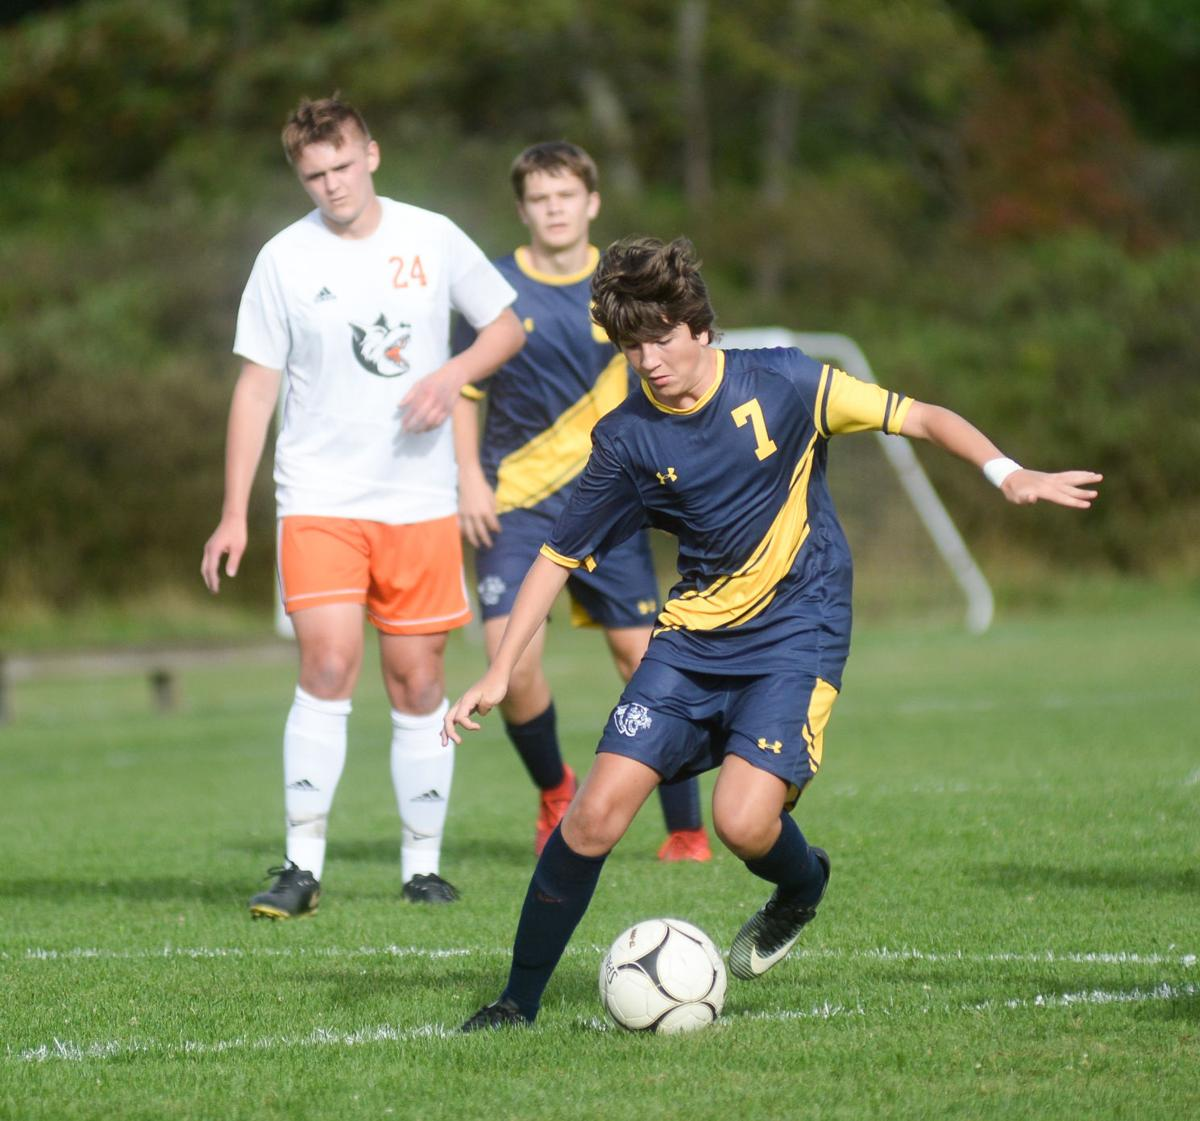 Boys Soccer - Saegertown vs. Harbor Creek